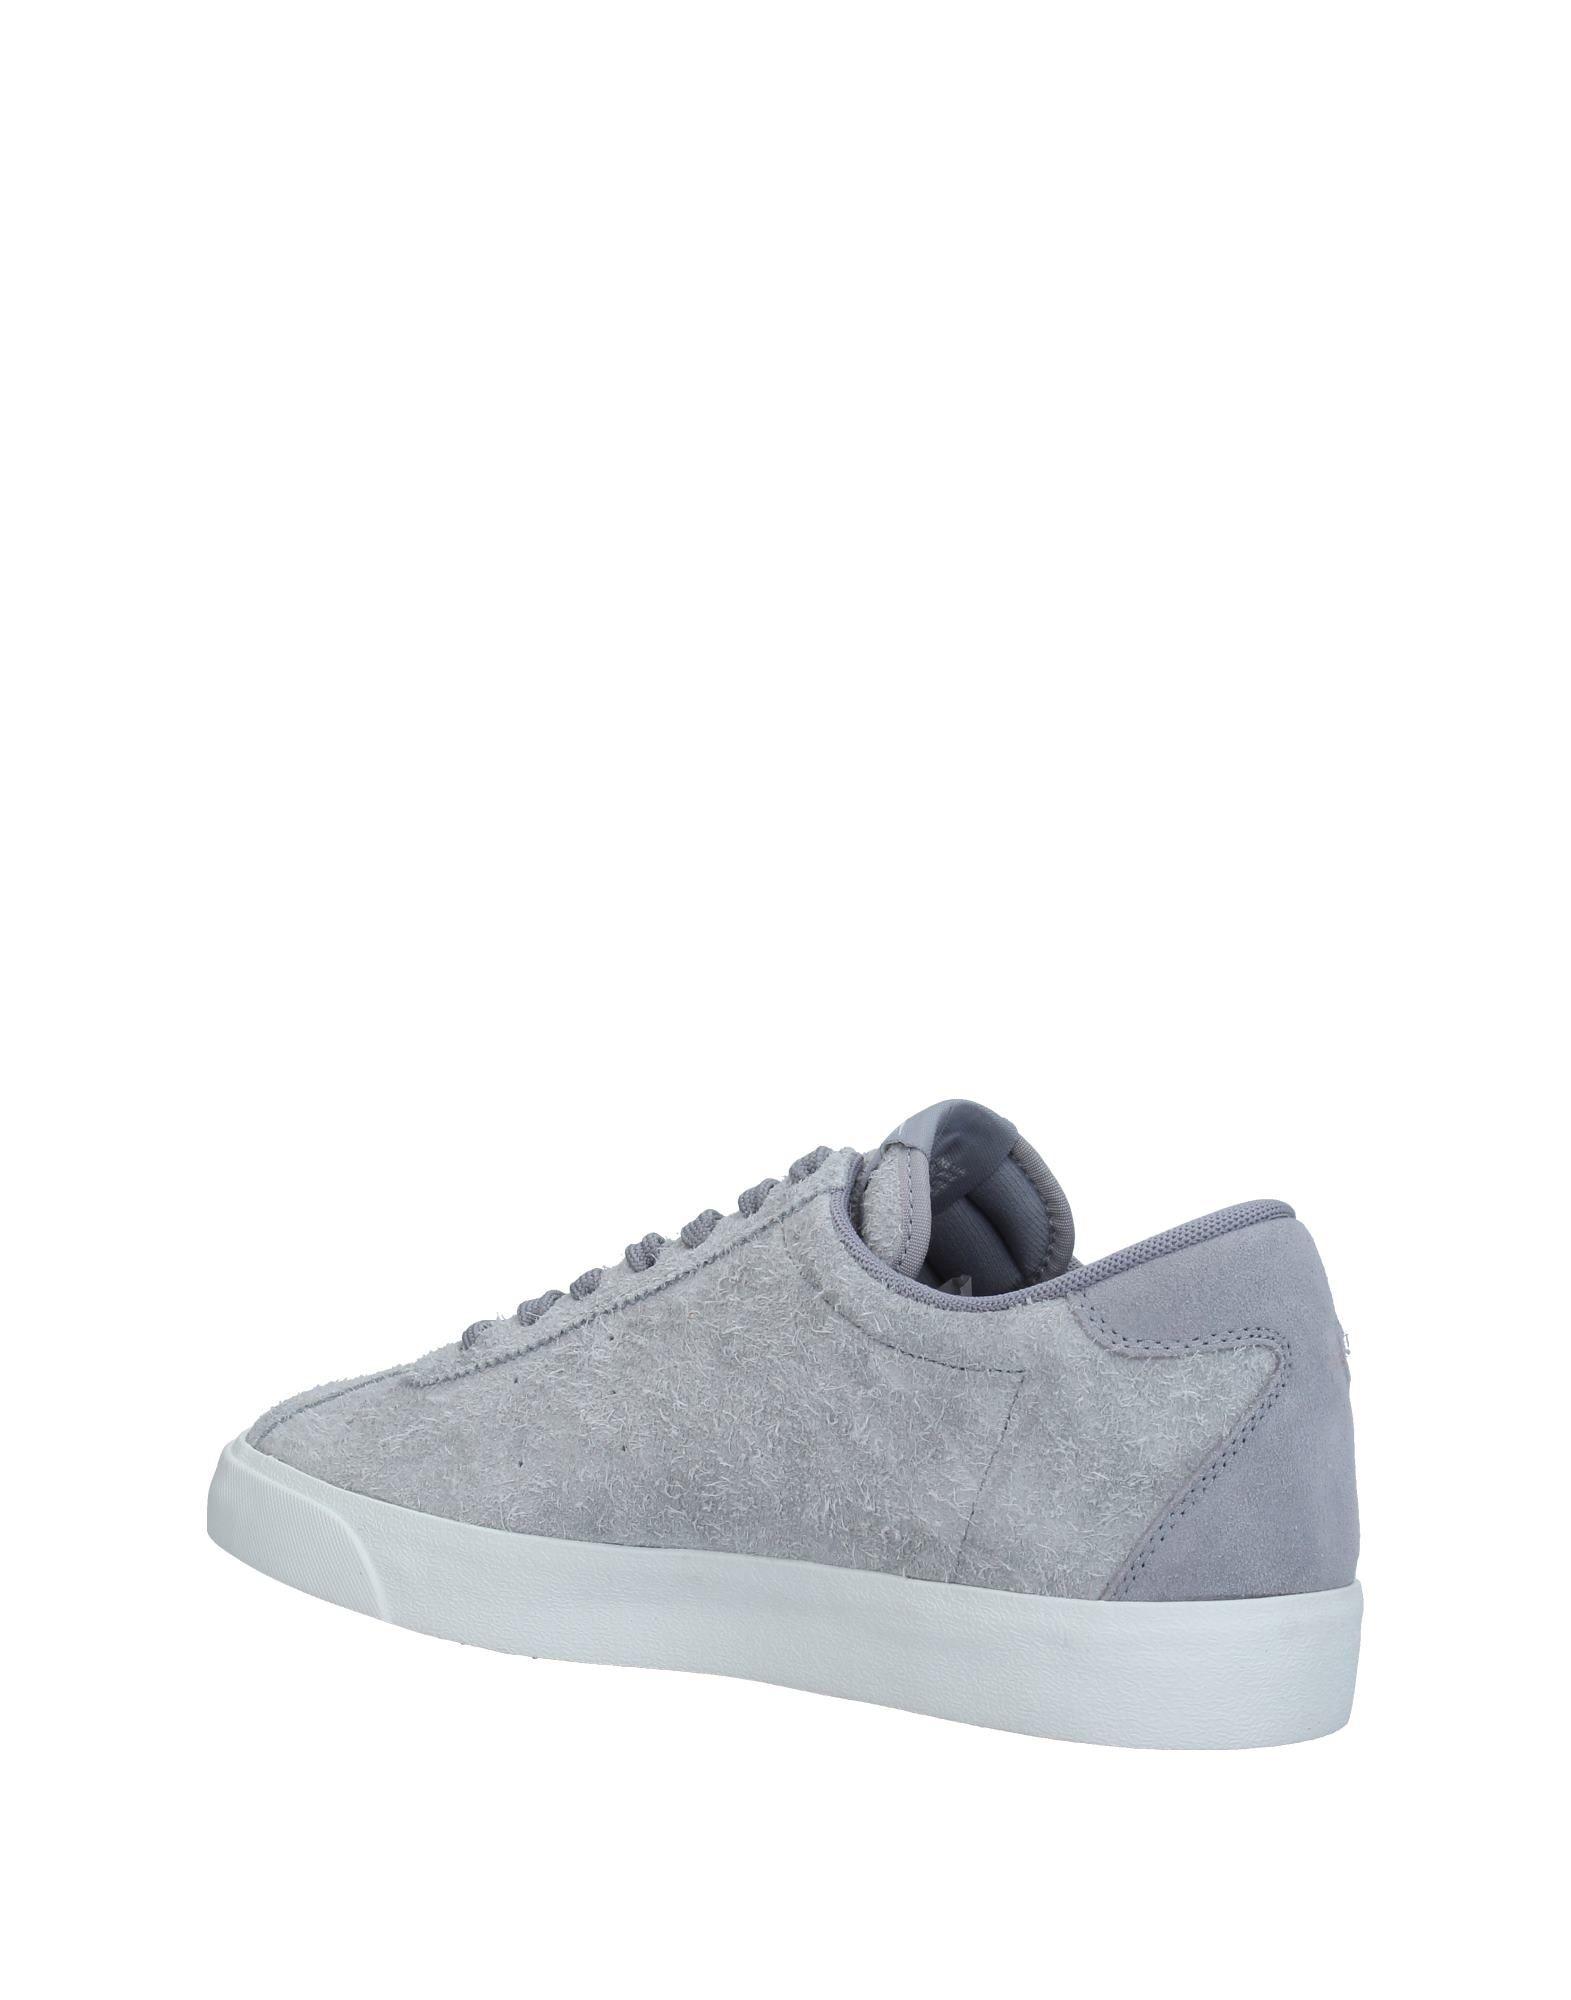 Nike Sneakers Herren Heiße  11335581FR Heiße Herren Schuhe f0f2b3